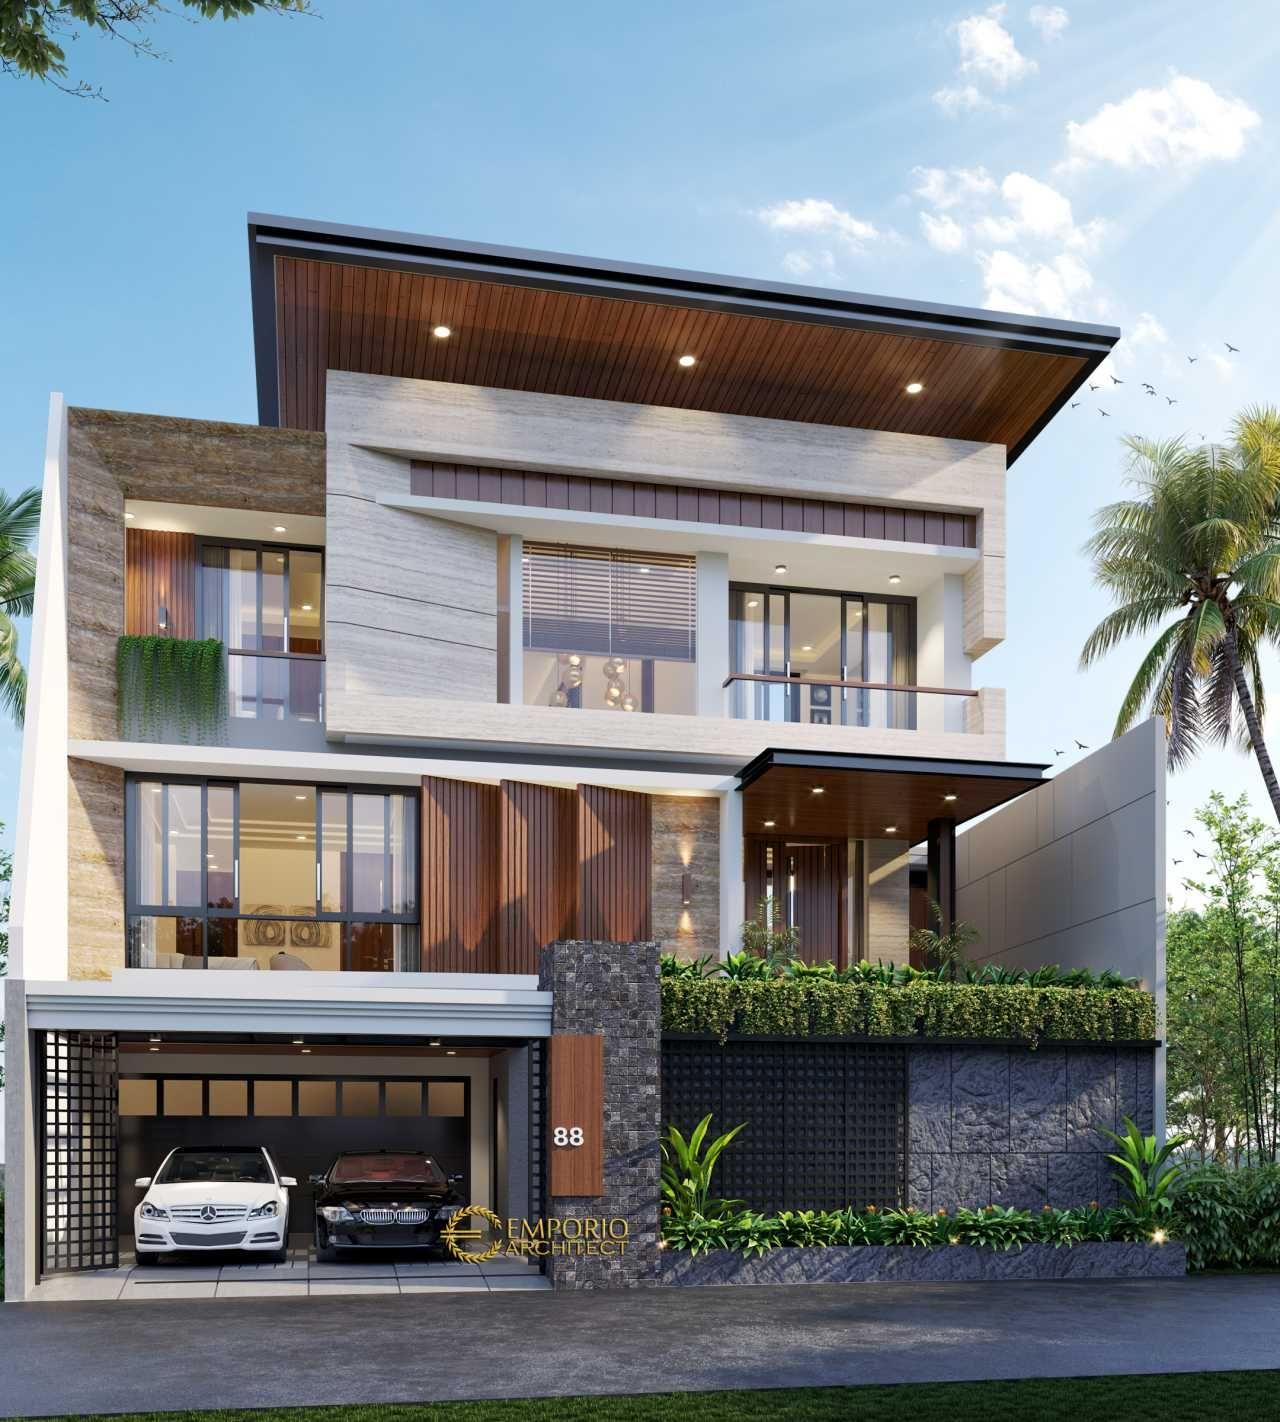 Desain Rumah Modern 3 Lantai Bapak Ruli di Bandung, Jawa Barat #arsitekrumahminimalis#rumahcantik#desainrumah3d#jasaarsitek#desainrumahbagus#rumahminimalis#rumahnyaman#rumahjakarta#rumahbagus#desainrumahtropis#rumah#jasadesainrumahonline#arsitekeksterior#desinrumahmodern#arsitekturindonesia#arsitekpalangkaraya#arsitekpalu#arsitekmagetan#arsitekdenpasar#arsitekbadung#arsitekkotamobagu#arsiteksingkawang#arsitekjakartabarat#arsitekbima#arsitekpematangsiantar#arsitekbogor